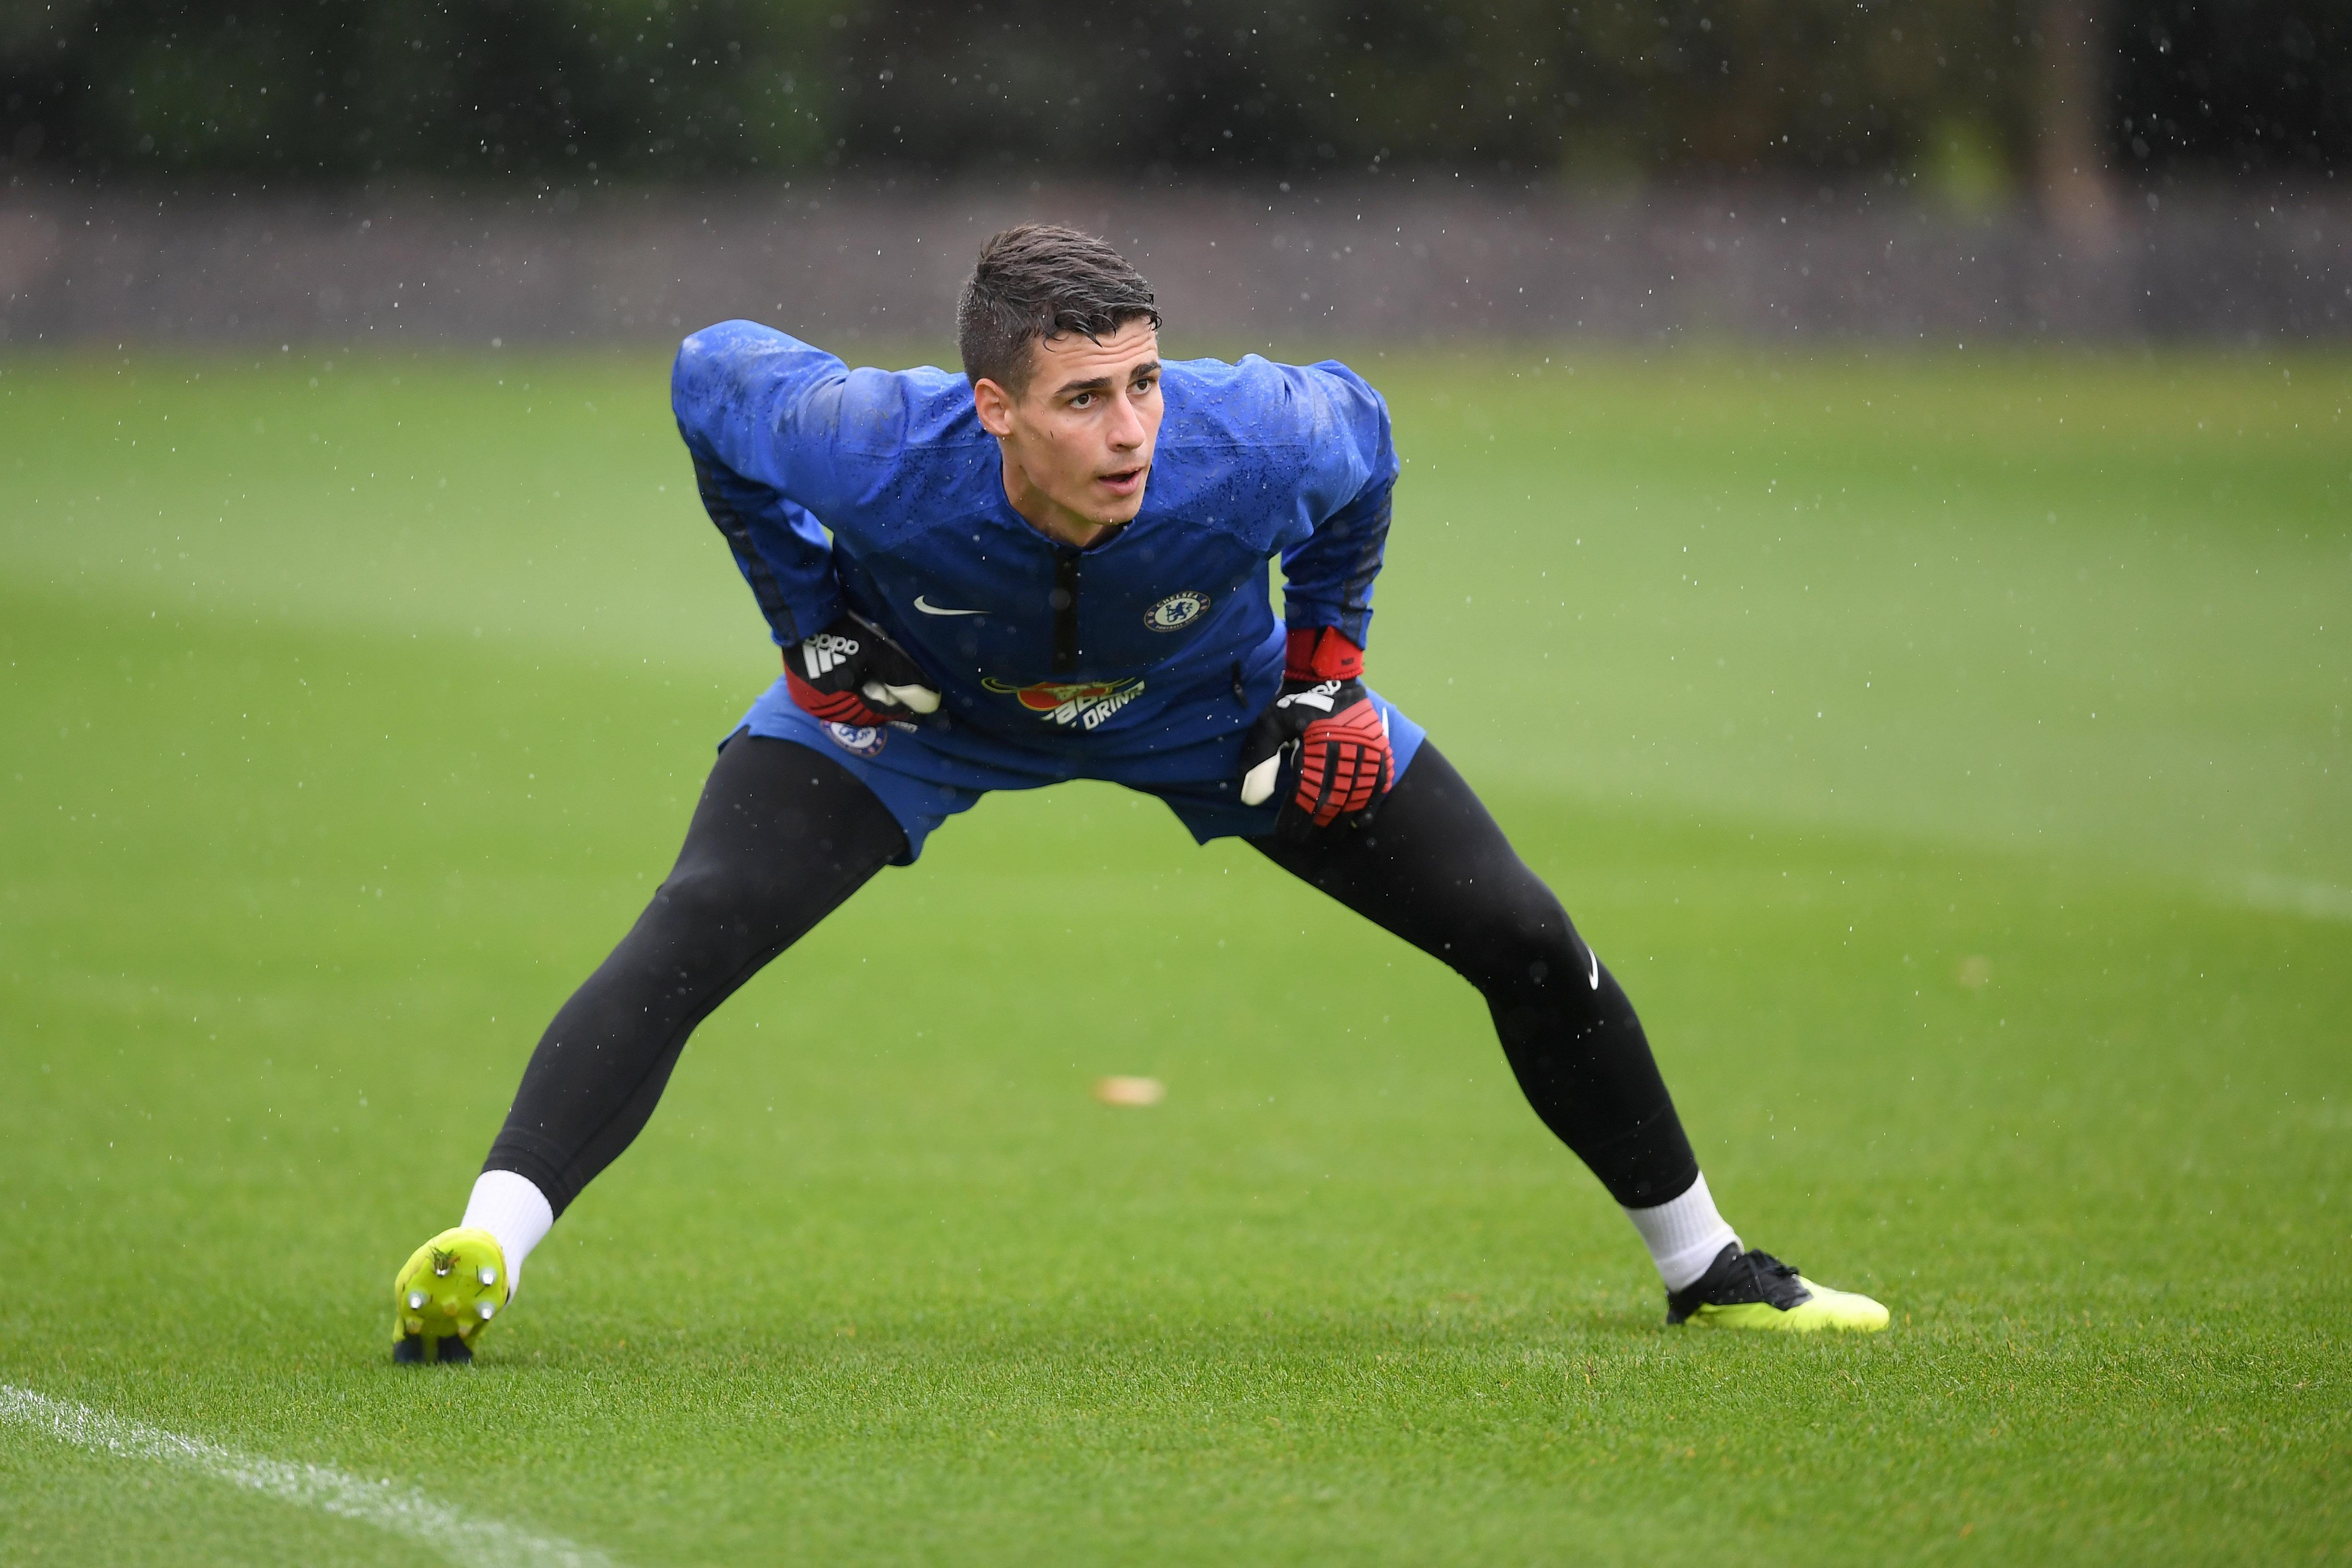 Spanish goalkeeper Kepa Arrizabalaga has joined Chelsea from Athletic Bilbao for £71.6million